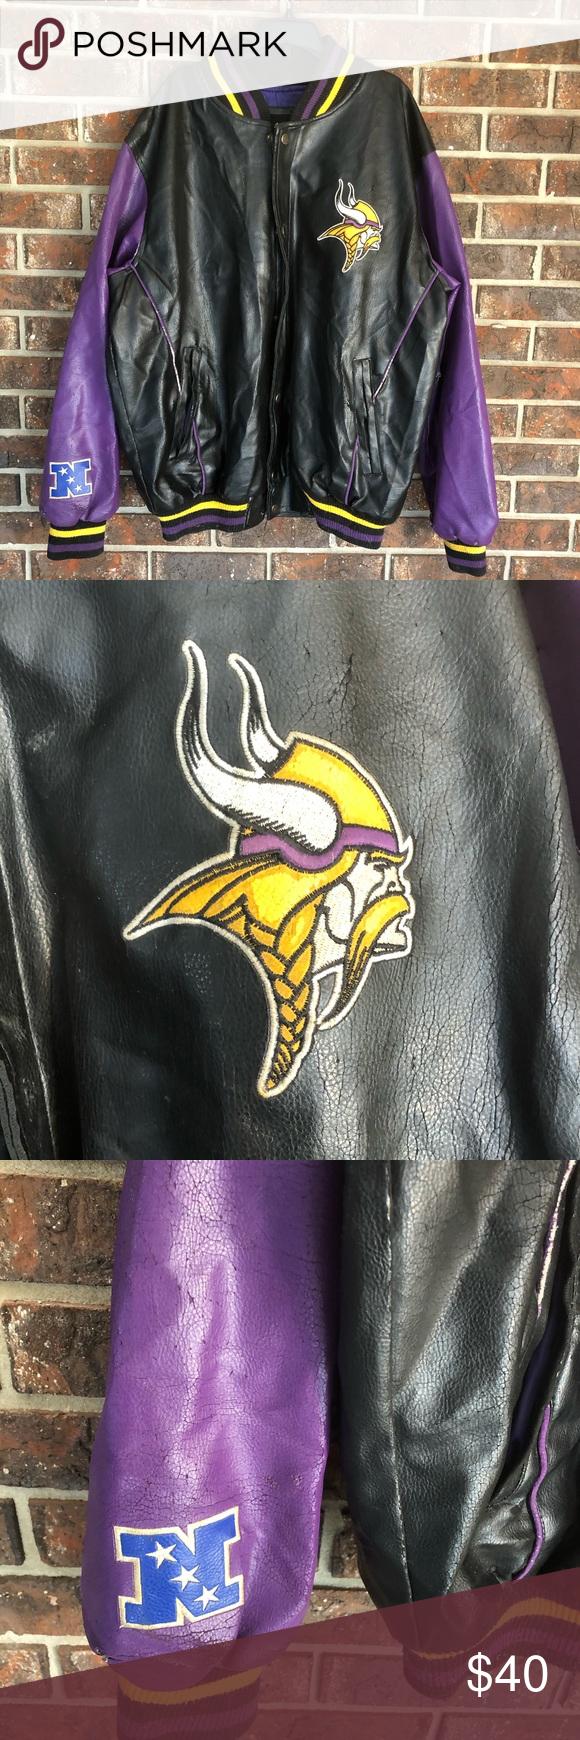 Nfl Minnesota Vikings Letterman Jacket Letterman Jacket Jackets Nfl [ 1740 x 580 Pixel ]